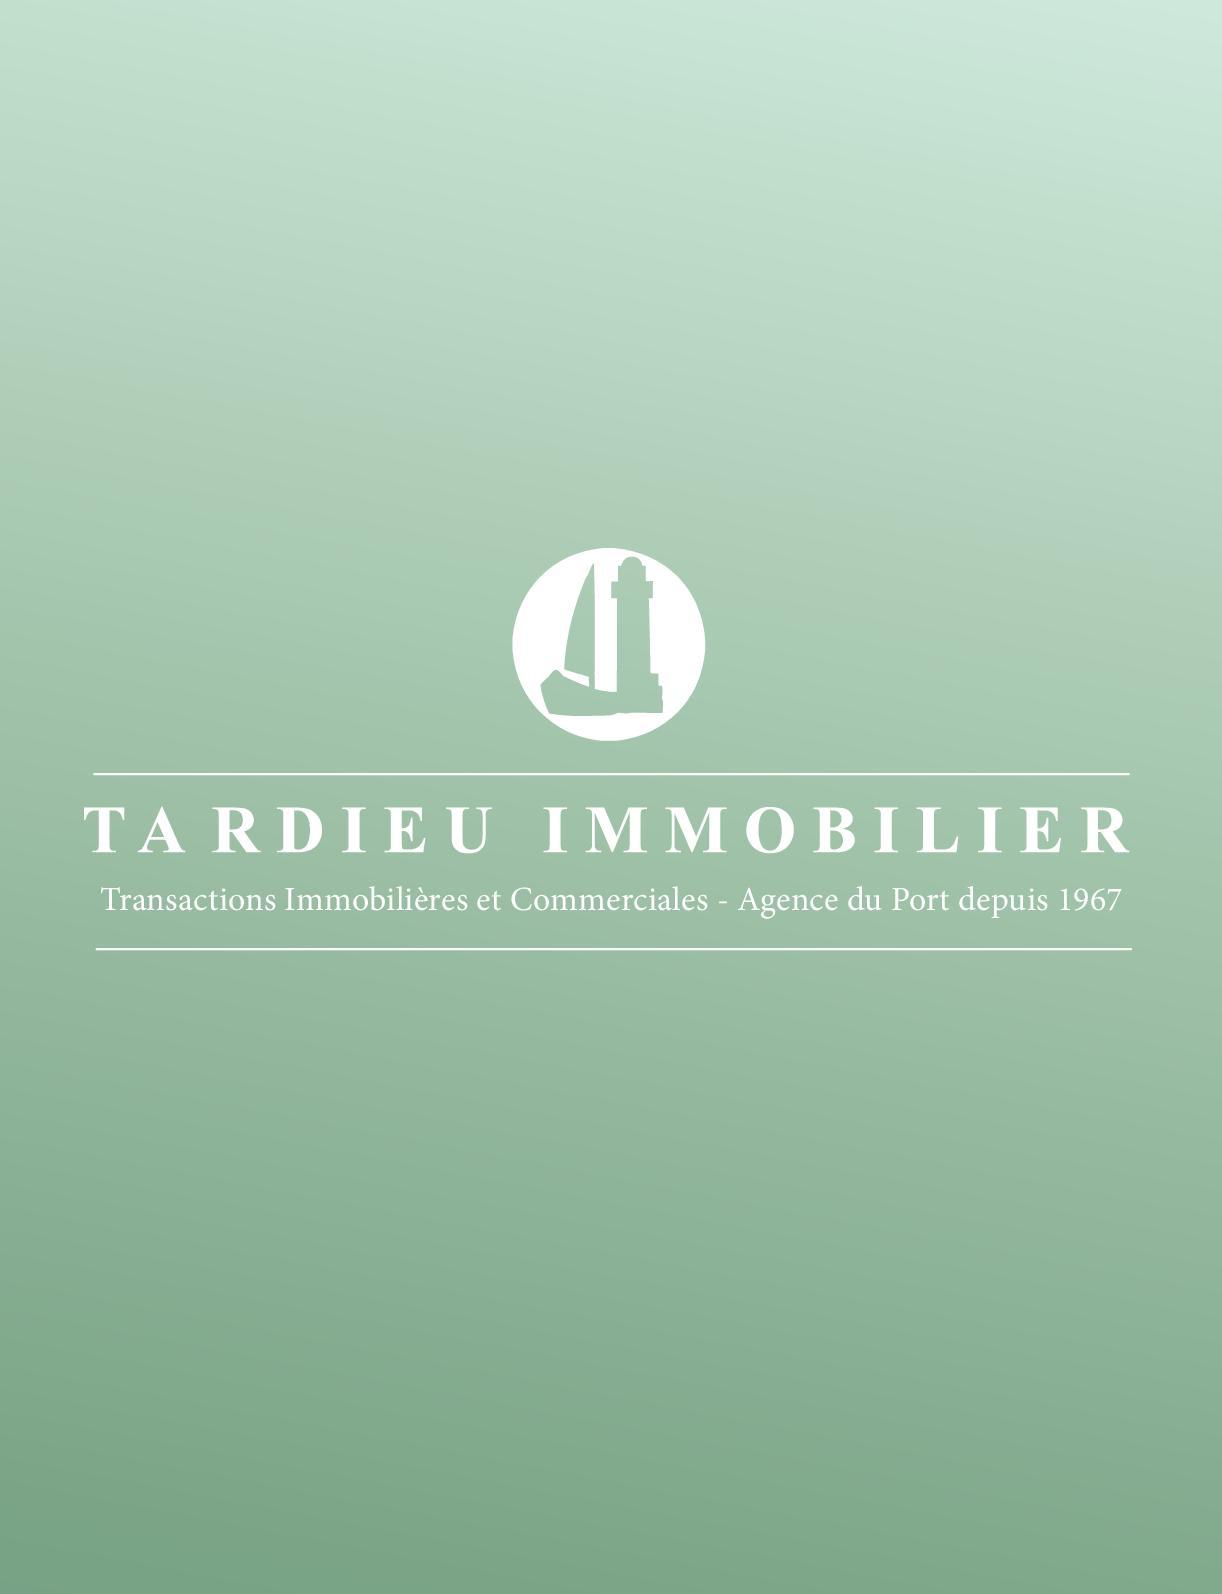 TARDIEU IMMOBILIER